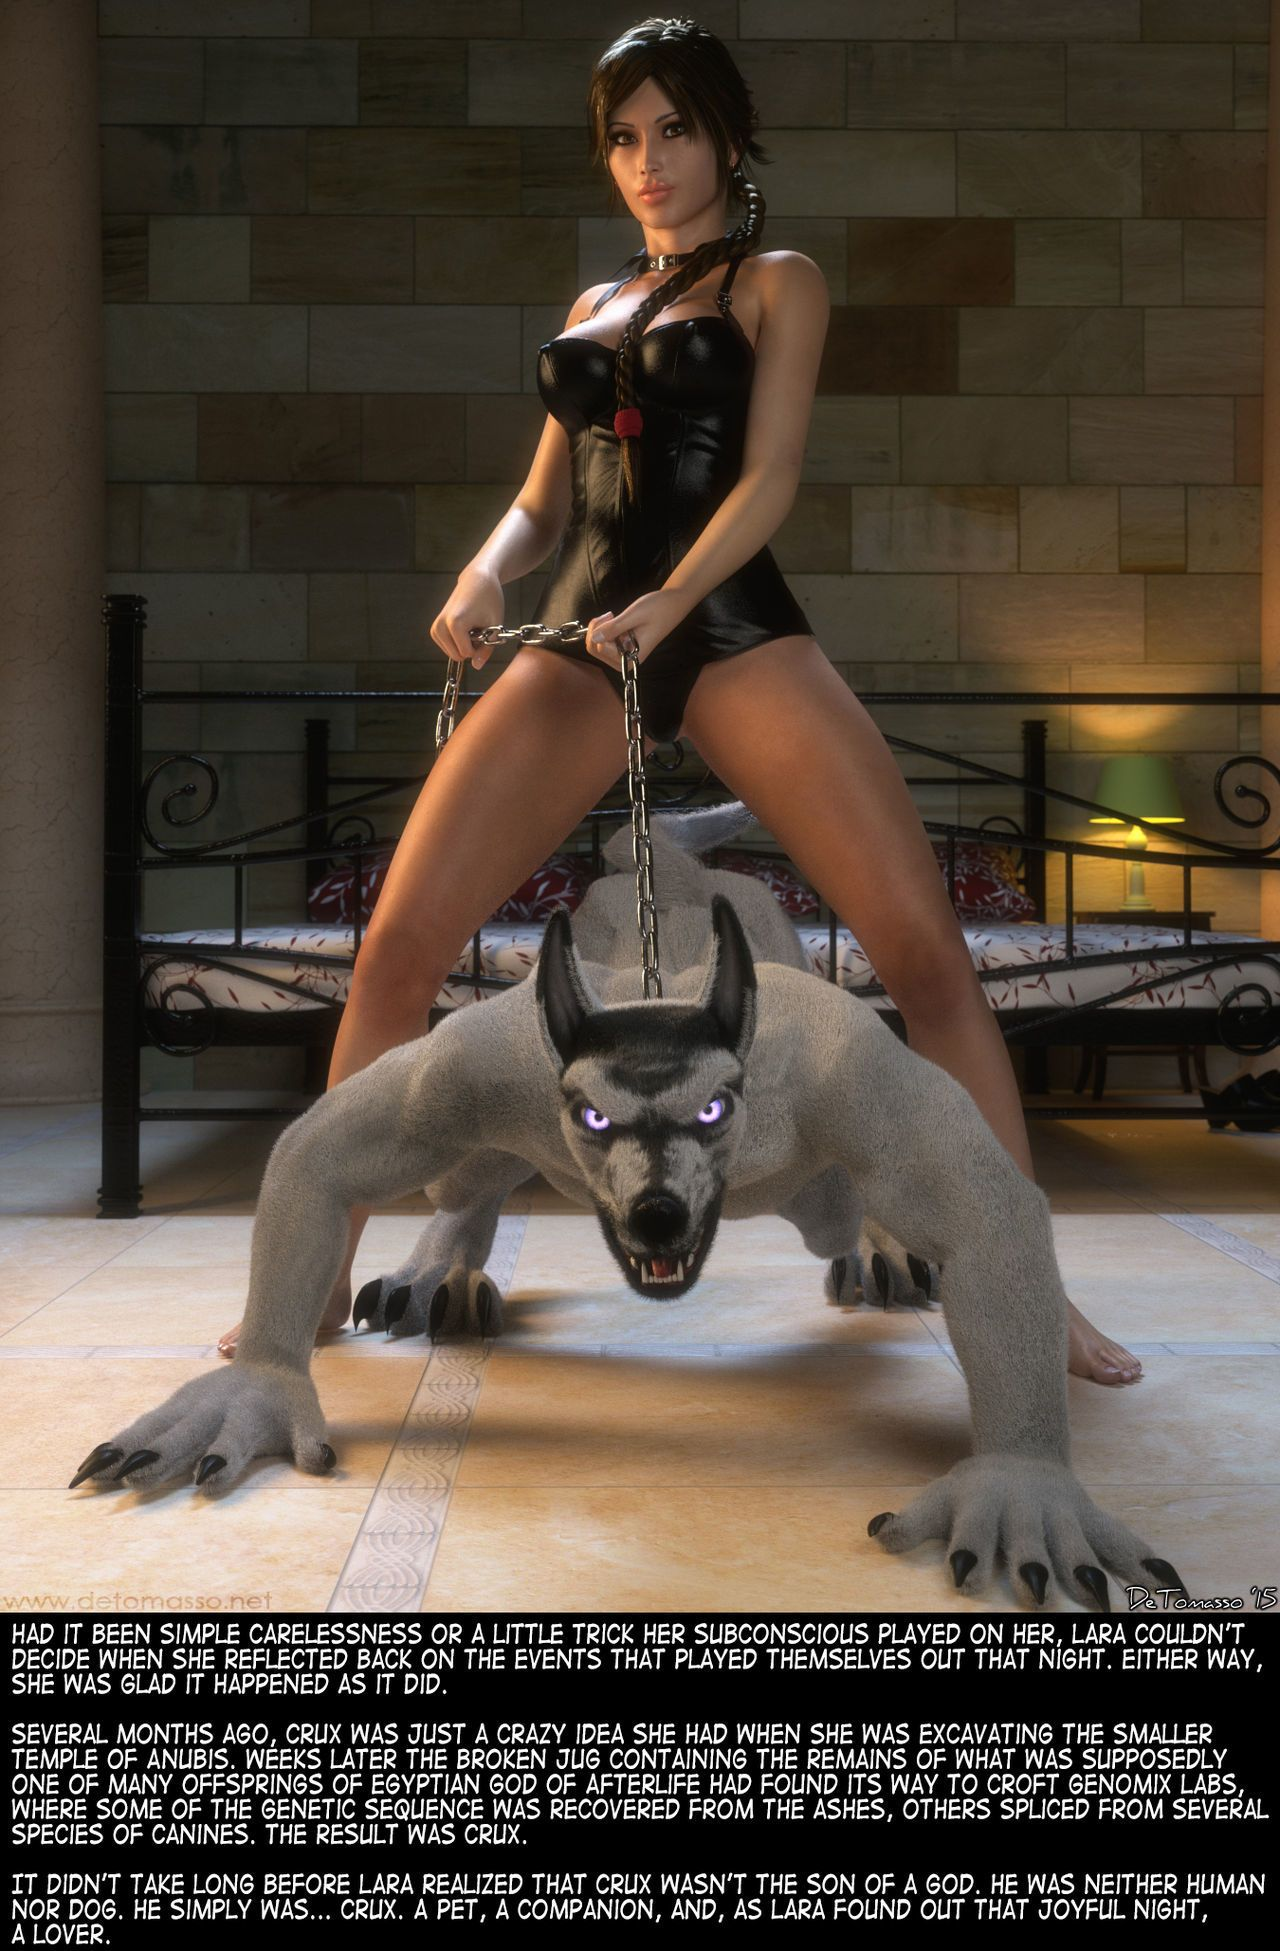 [DeTomasso] Crux on the Loose (Tomb Raider)